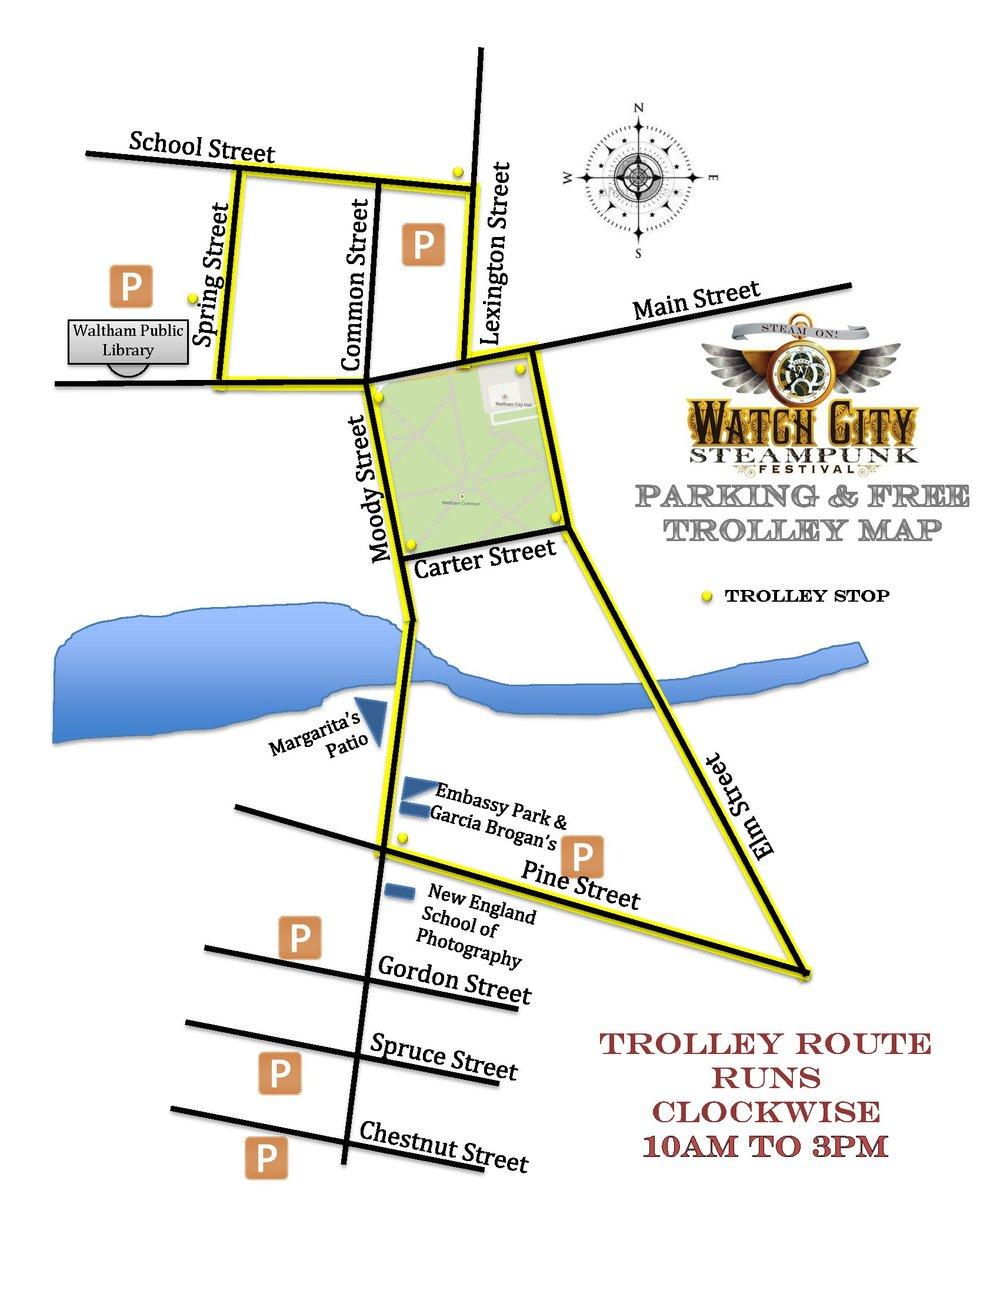 WCSF 2018 Parking & Trolly Map.jpg